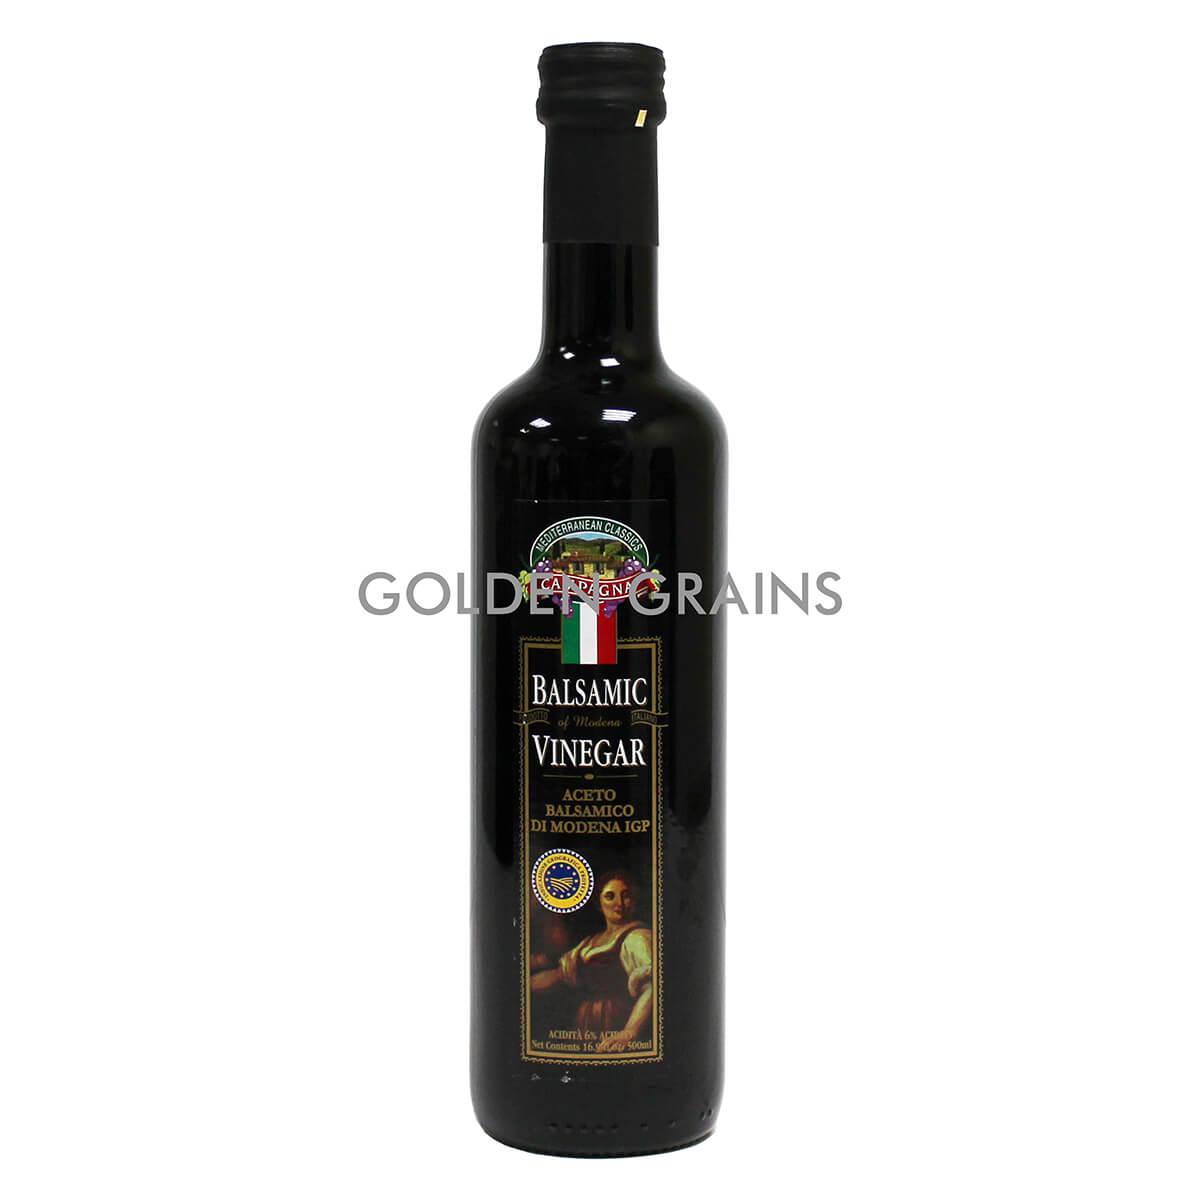 Golden Grains Campagna - Balsamic Vinegar - 500G - Italy - Front.jpg